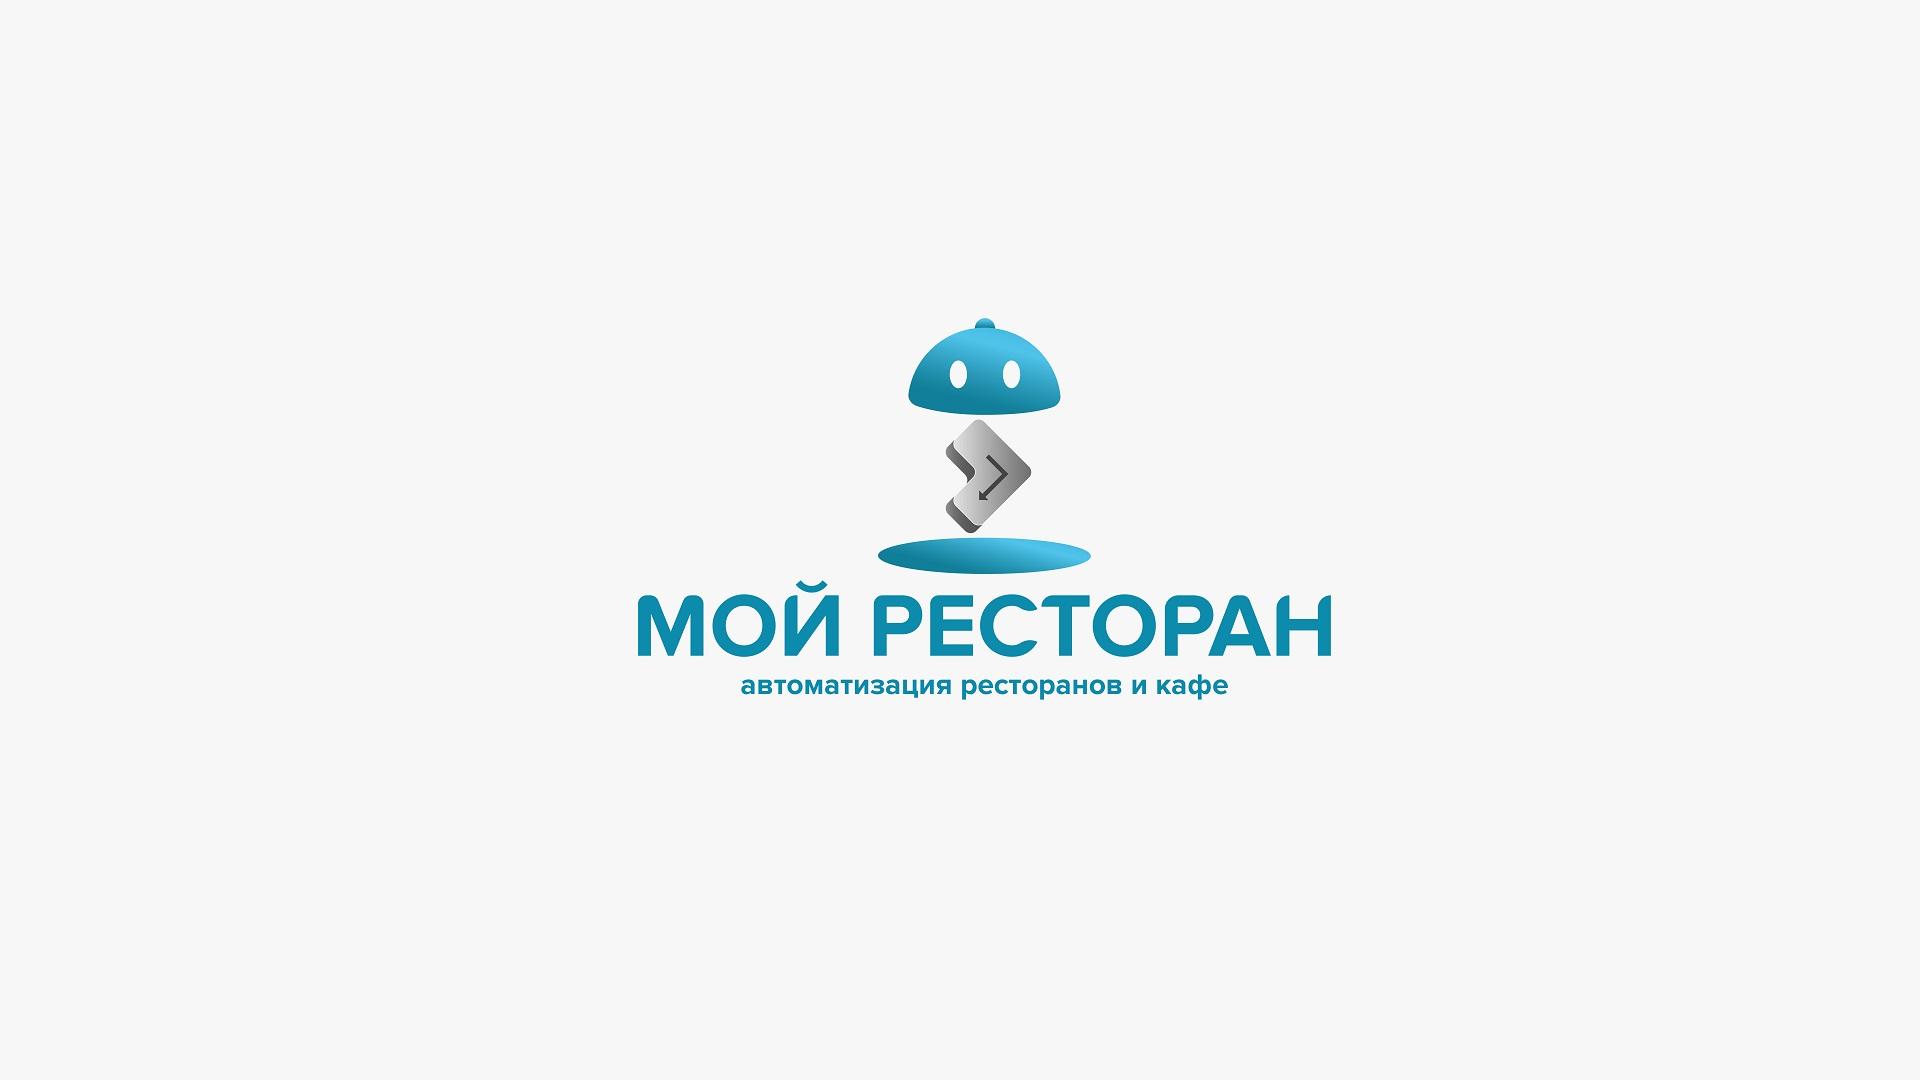 Разработать логотип и фавикон для IT- компании фото f_6875d52ecb152505.jpg